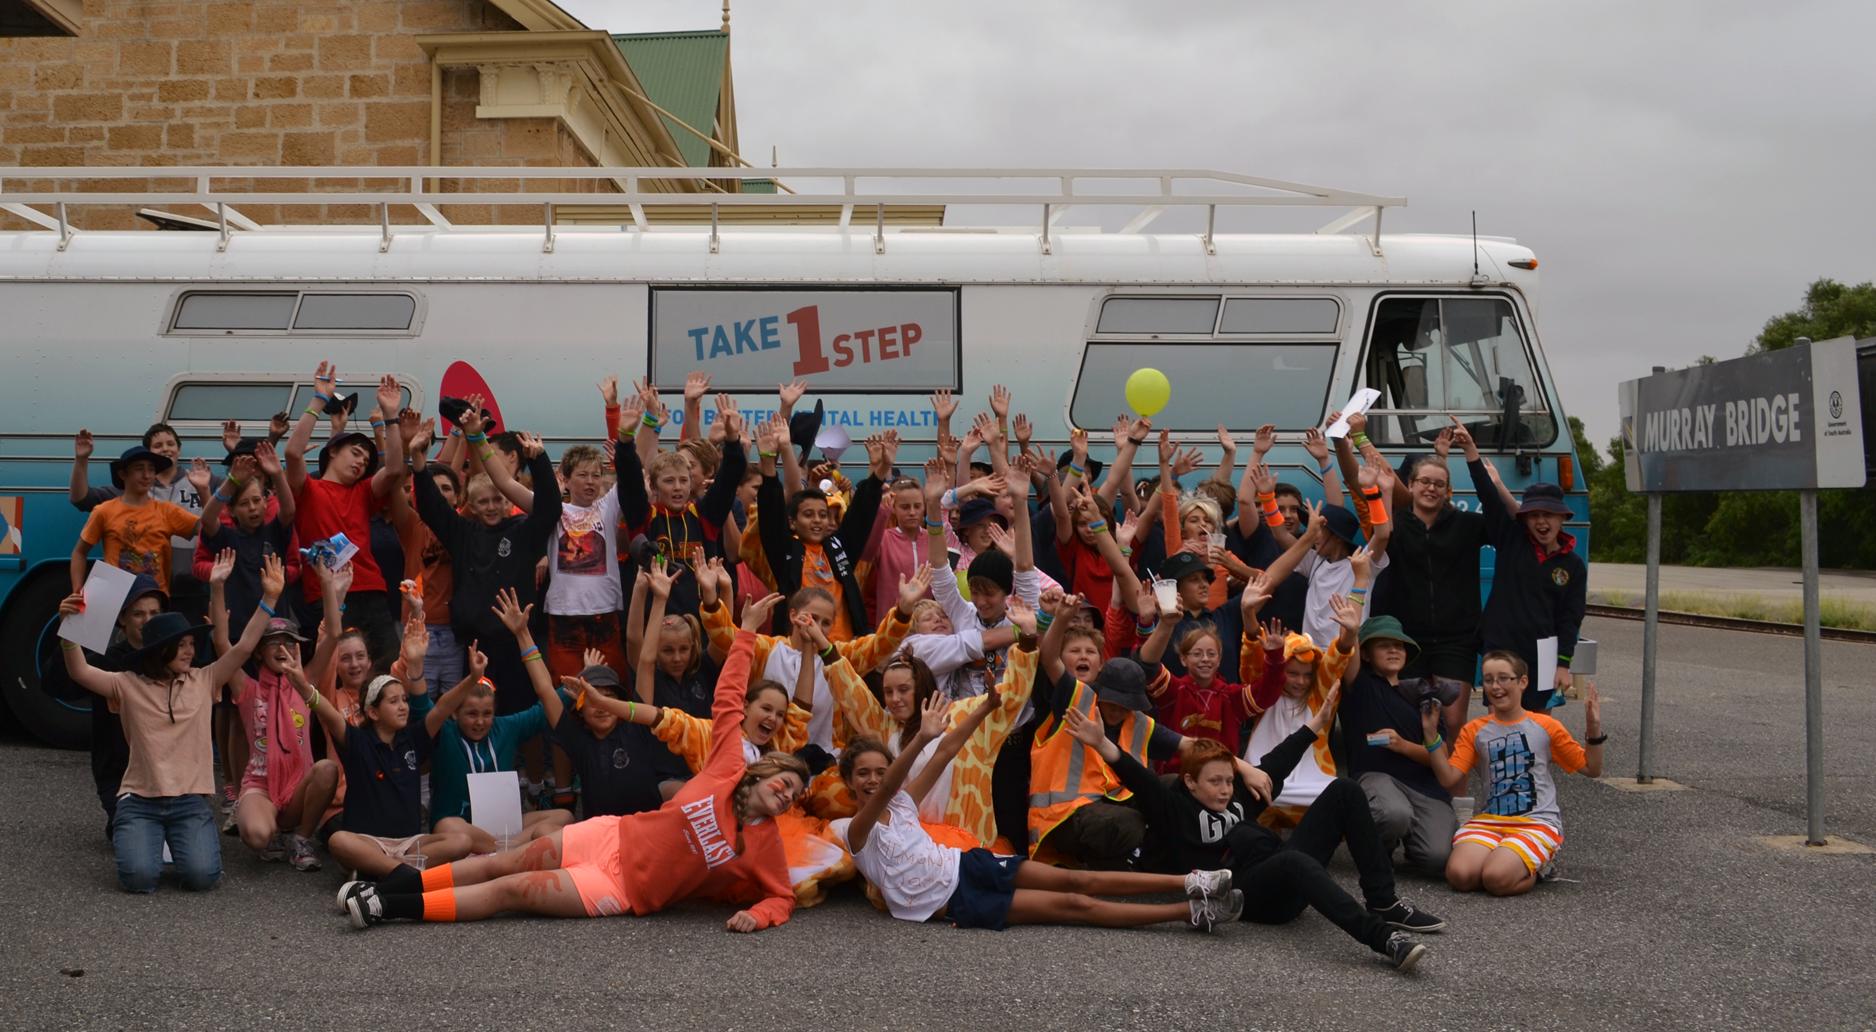 A school group in Murray Bridge visit the bus.